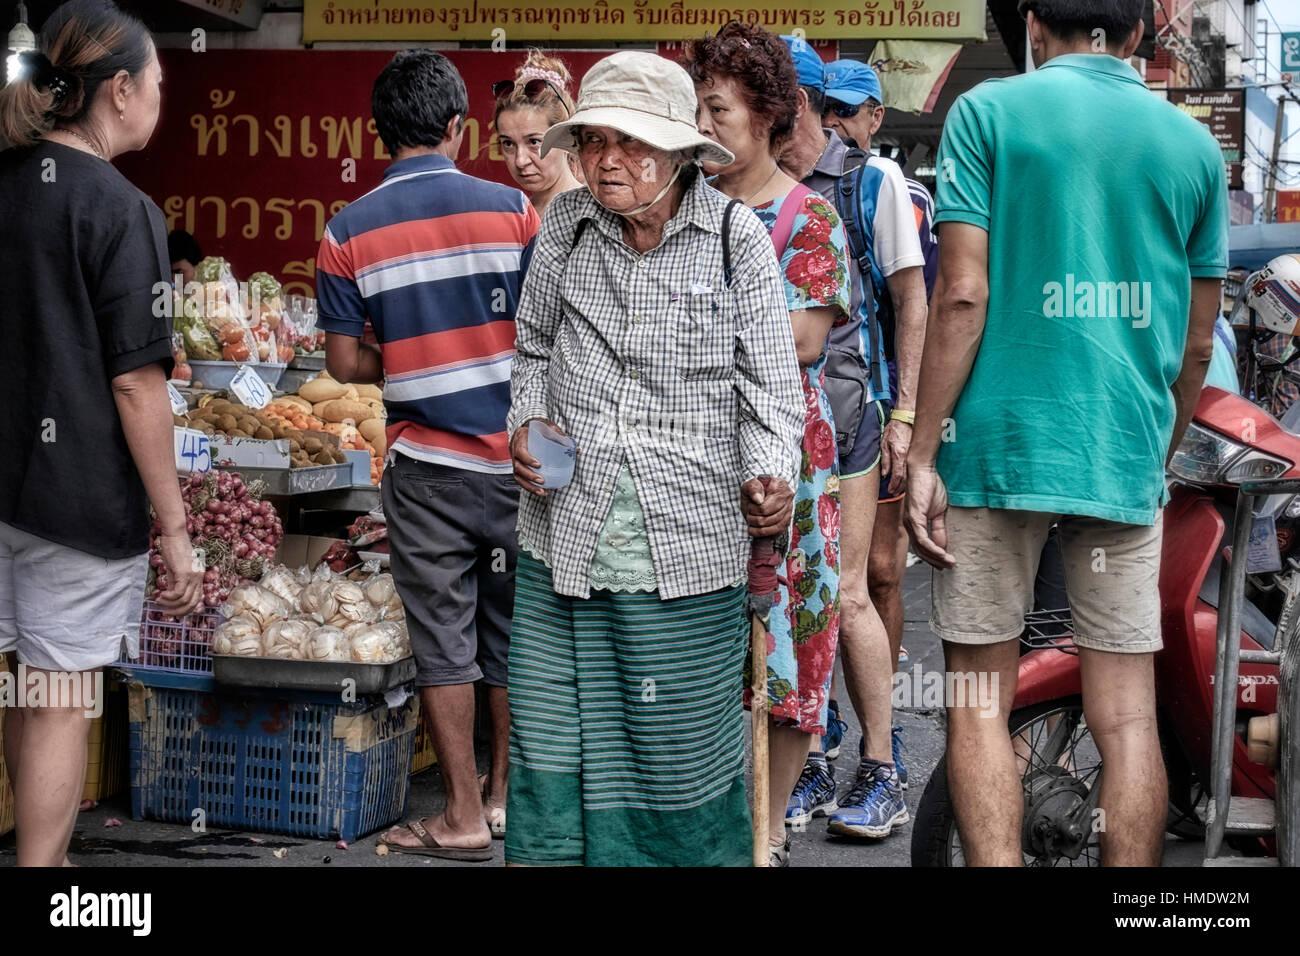 Elderly shoeless Thai woman beggar on the streets. Pattaya Thailand Southeast Asia - Stock Image